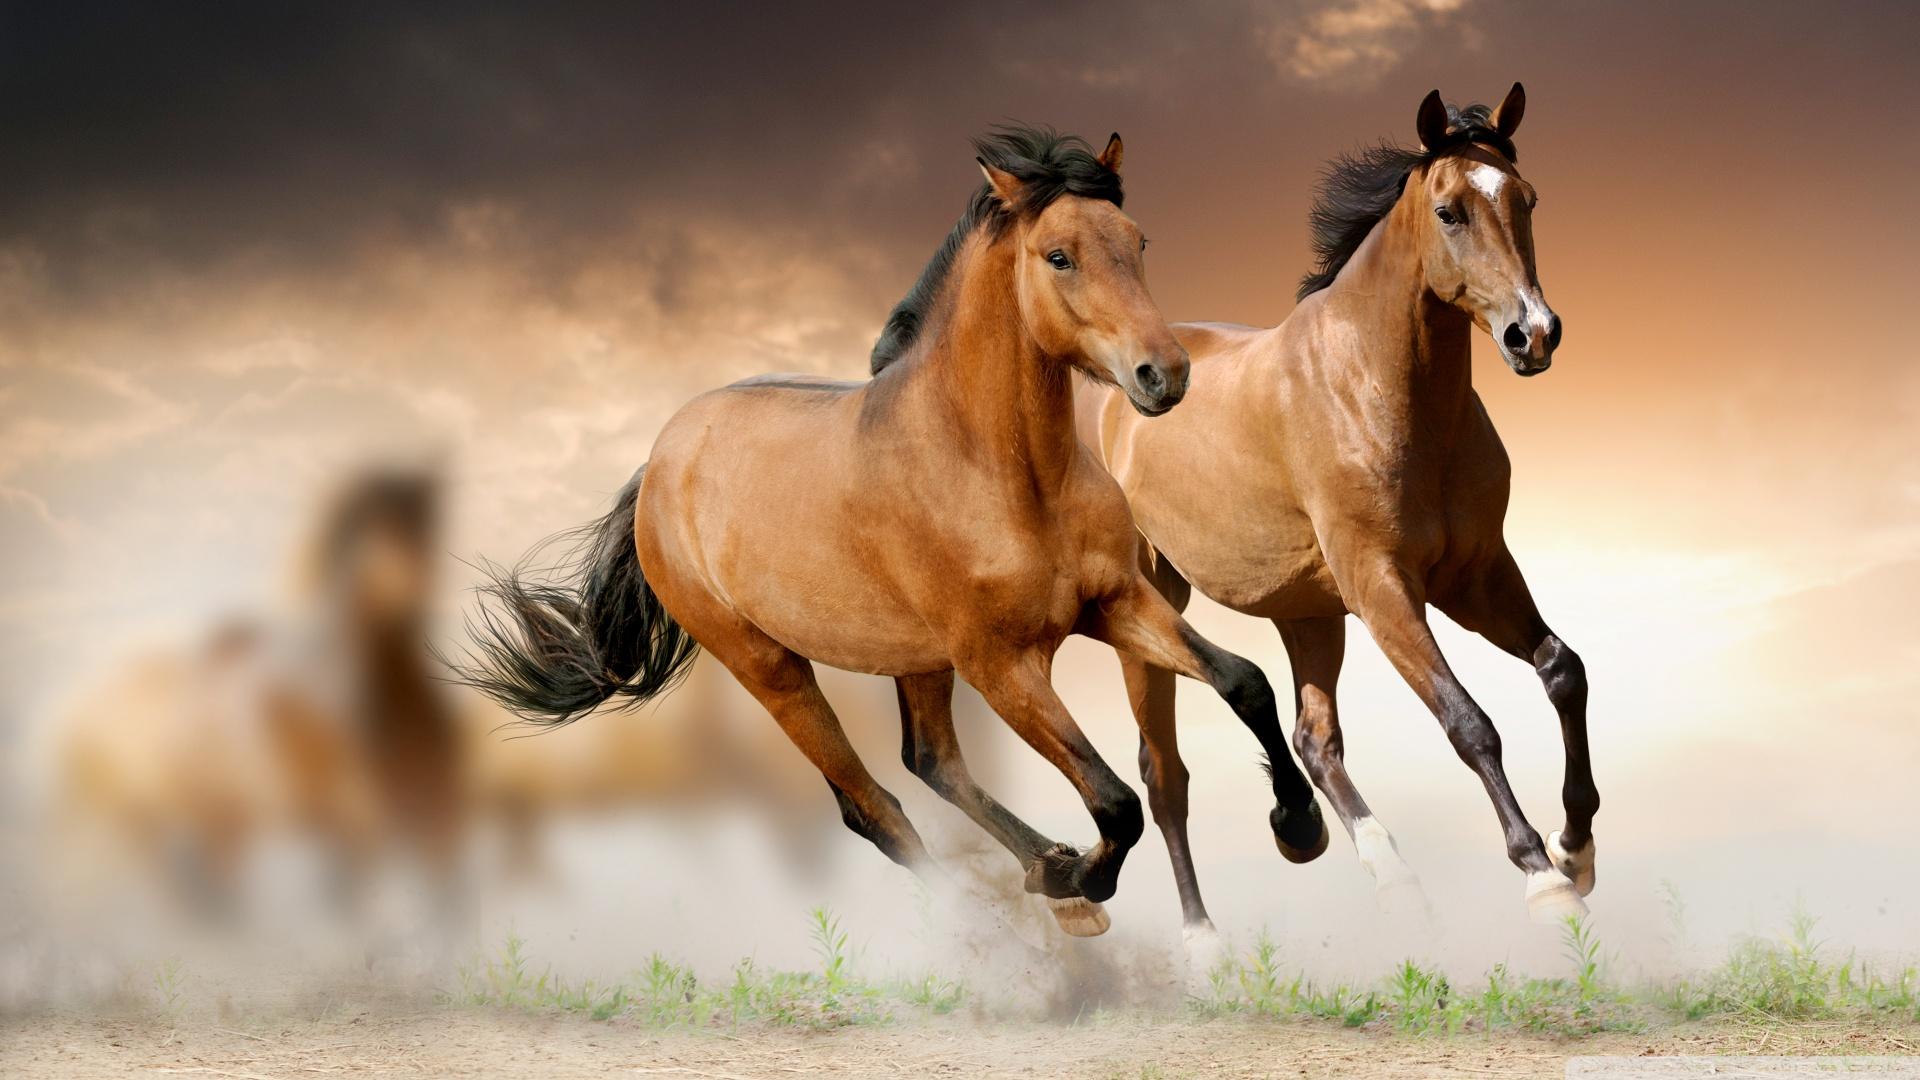 Horses Running 4K HD Desktop Wallpaper for 4K Ultra HD TV 1920x1080